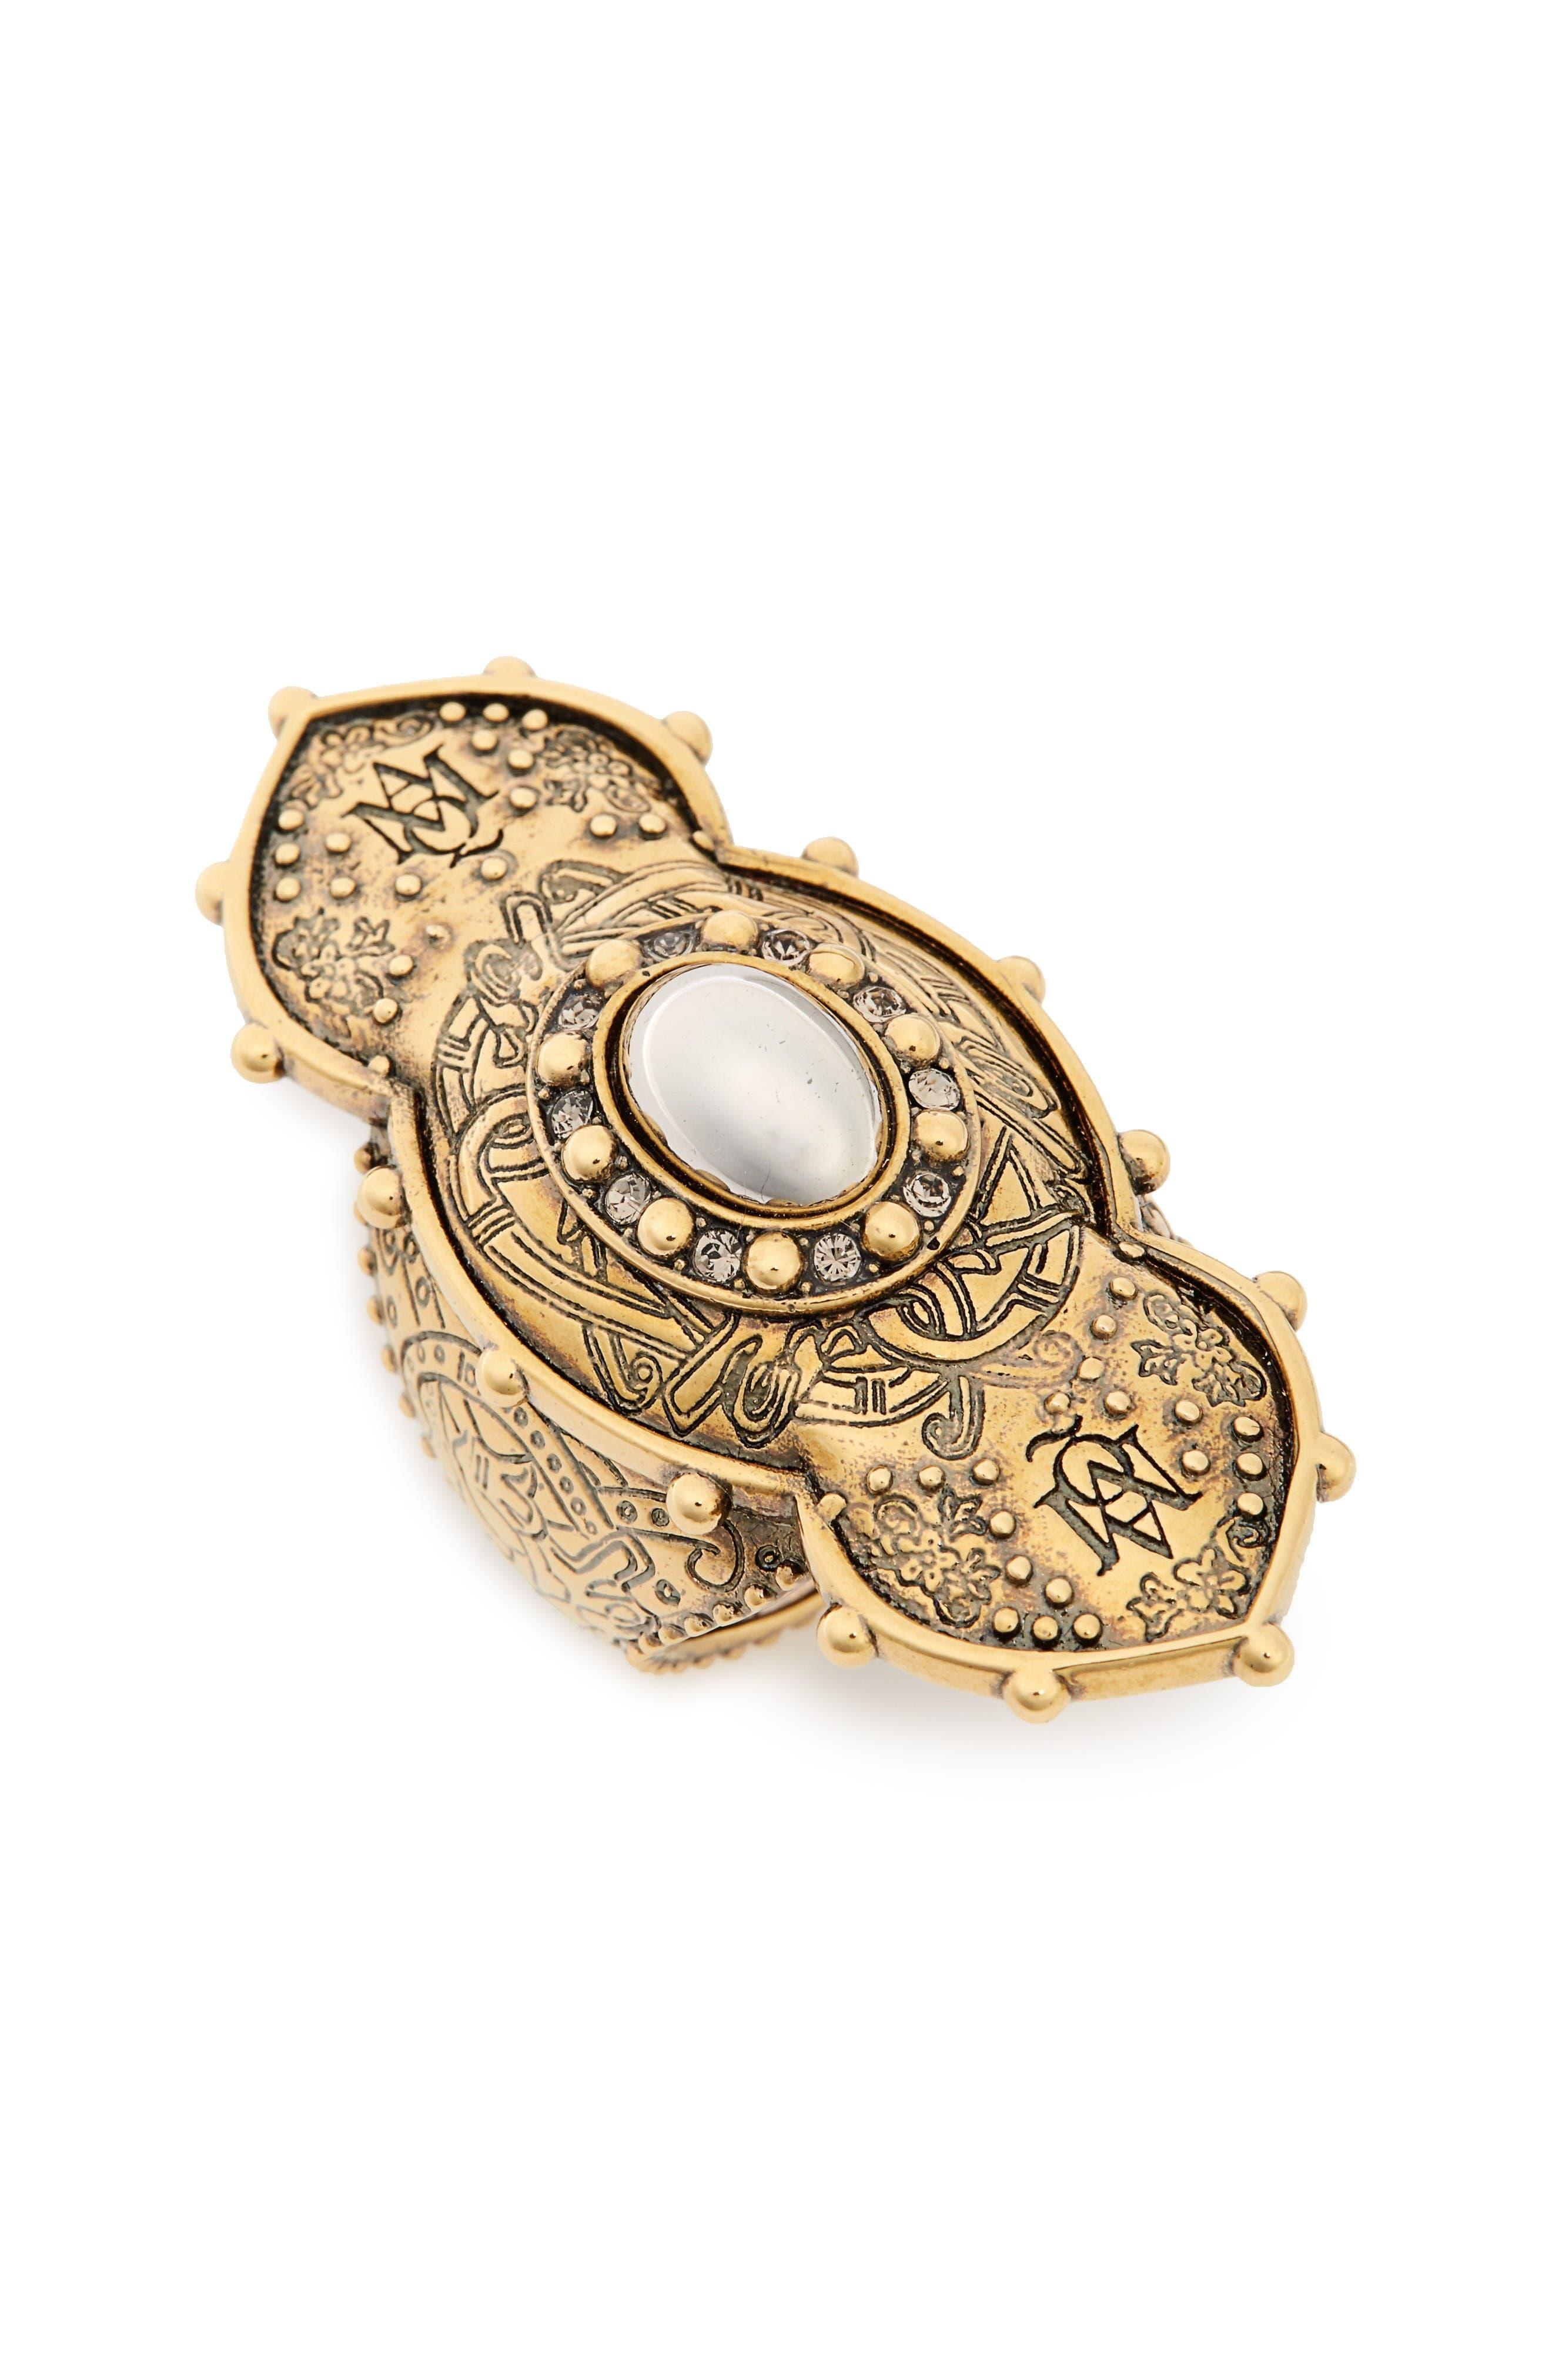 Main Image - Alexander McQueen Jewel Oval Ring